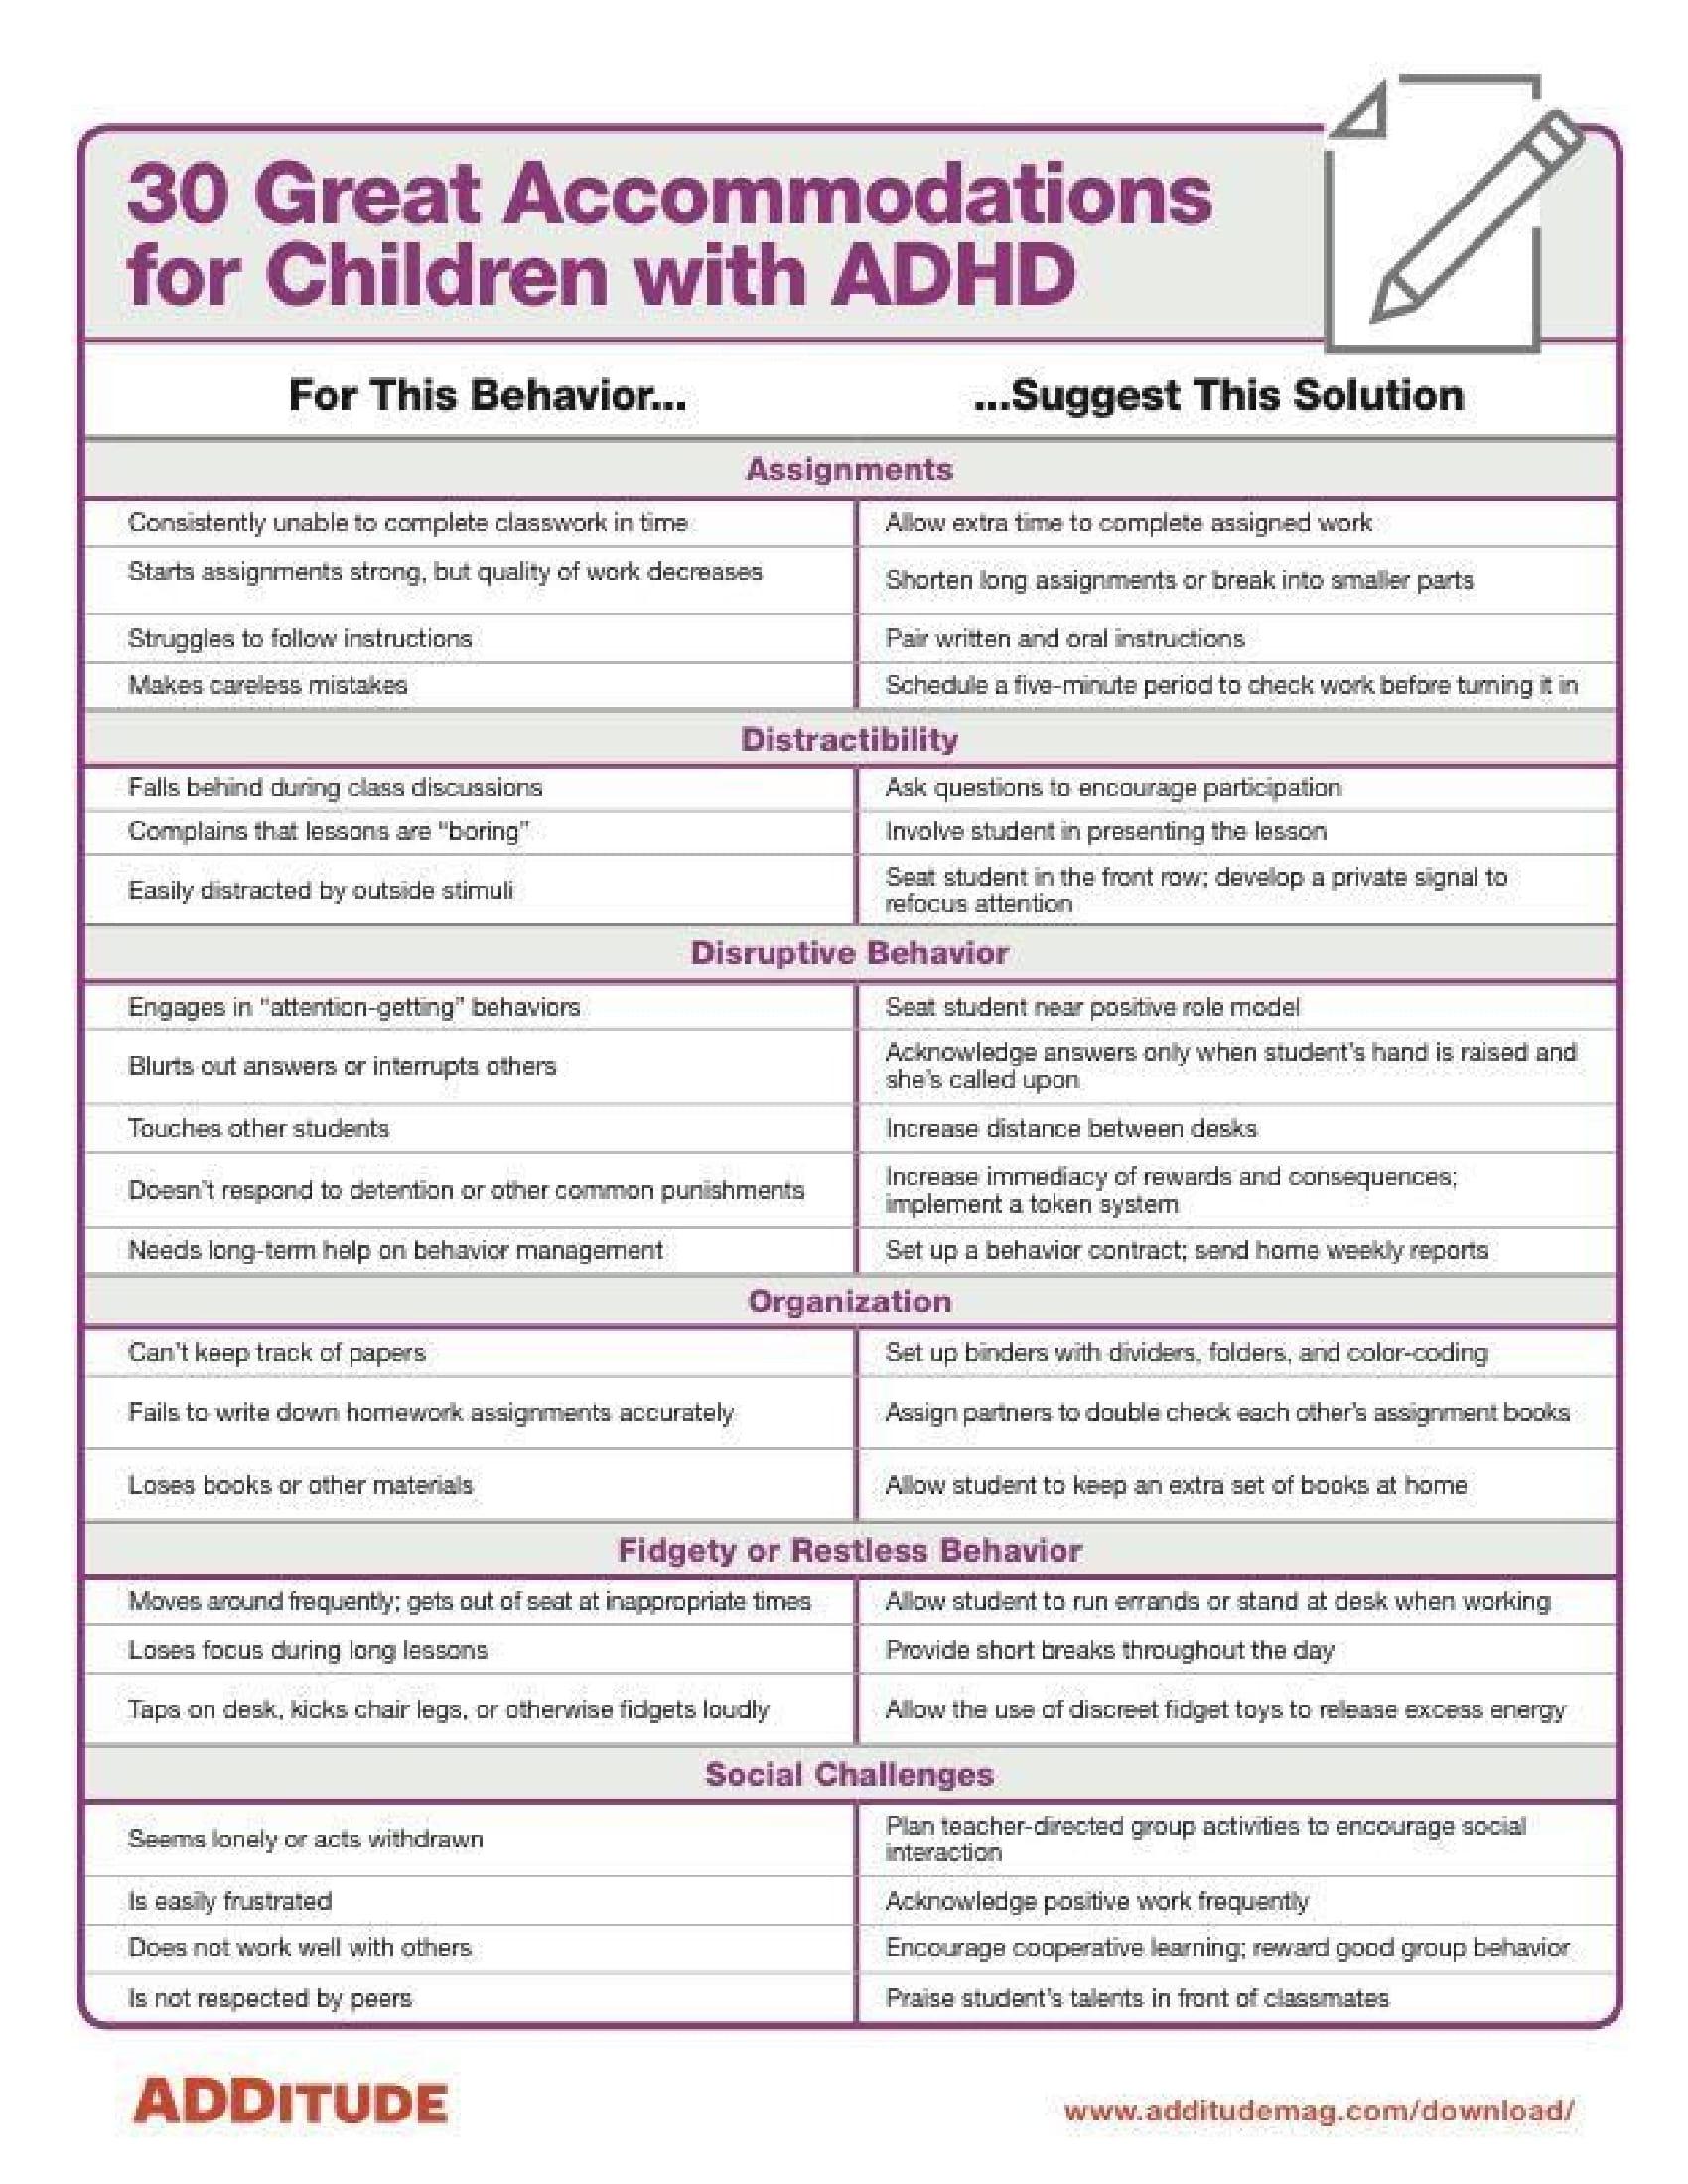 ADD tips-1.jpg